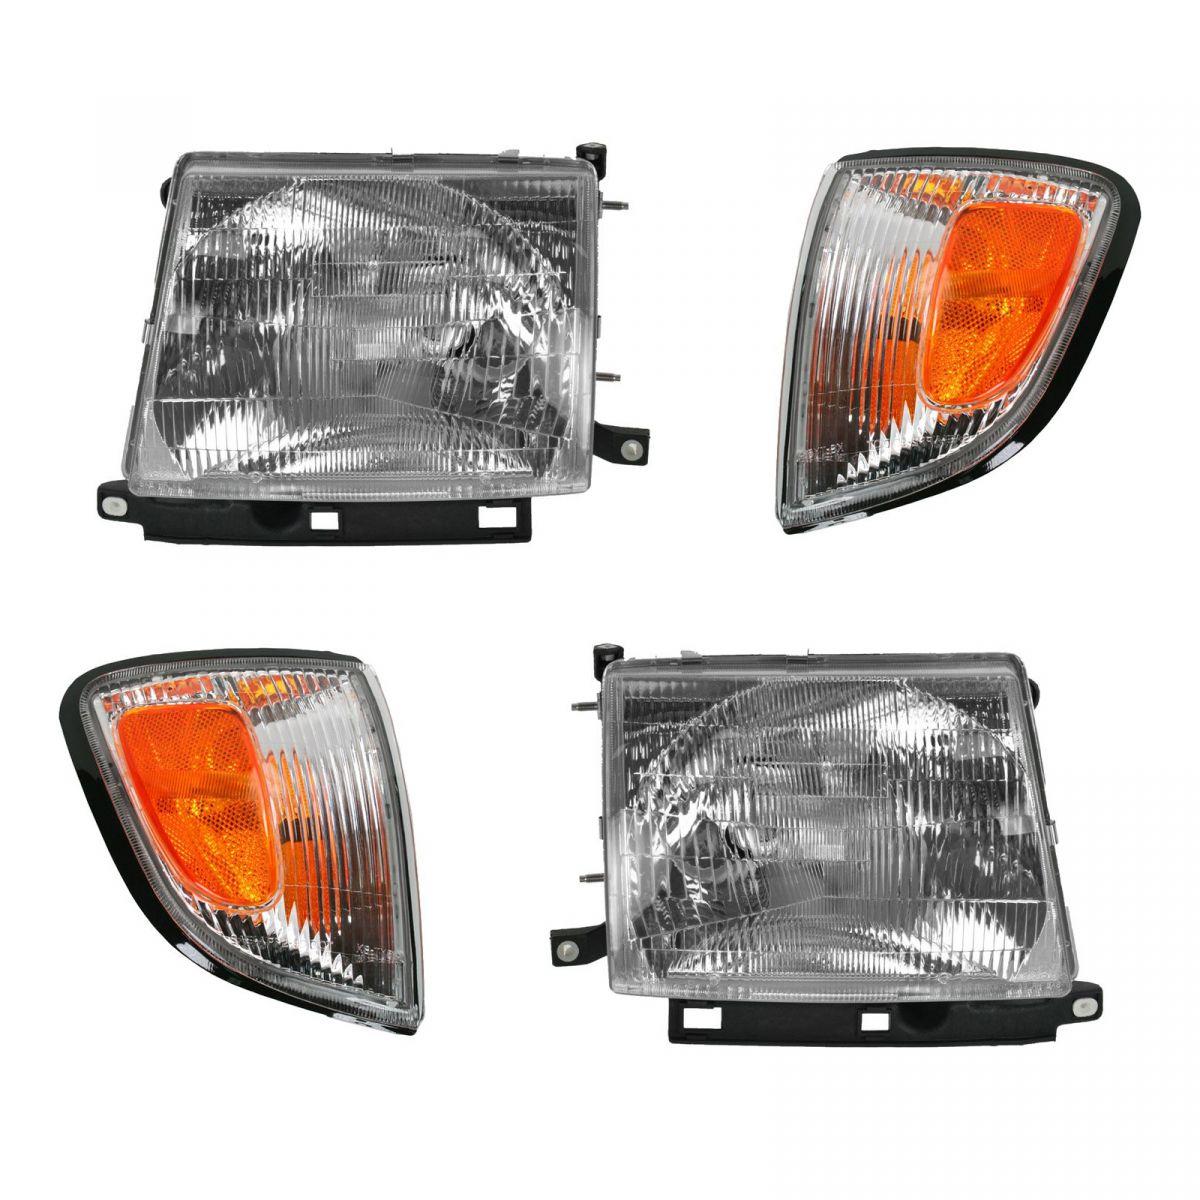 Headlights & Parking Corner Lights Left & Right Kit Set for 97-00 Tacoma 2WD 2x4